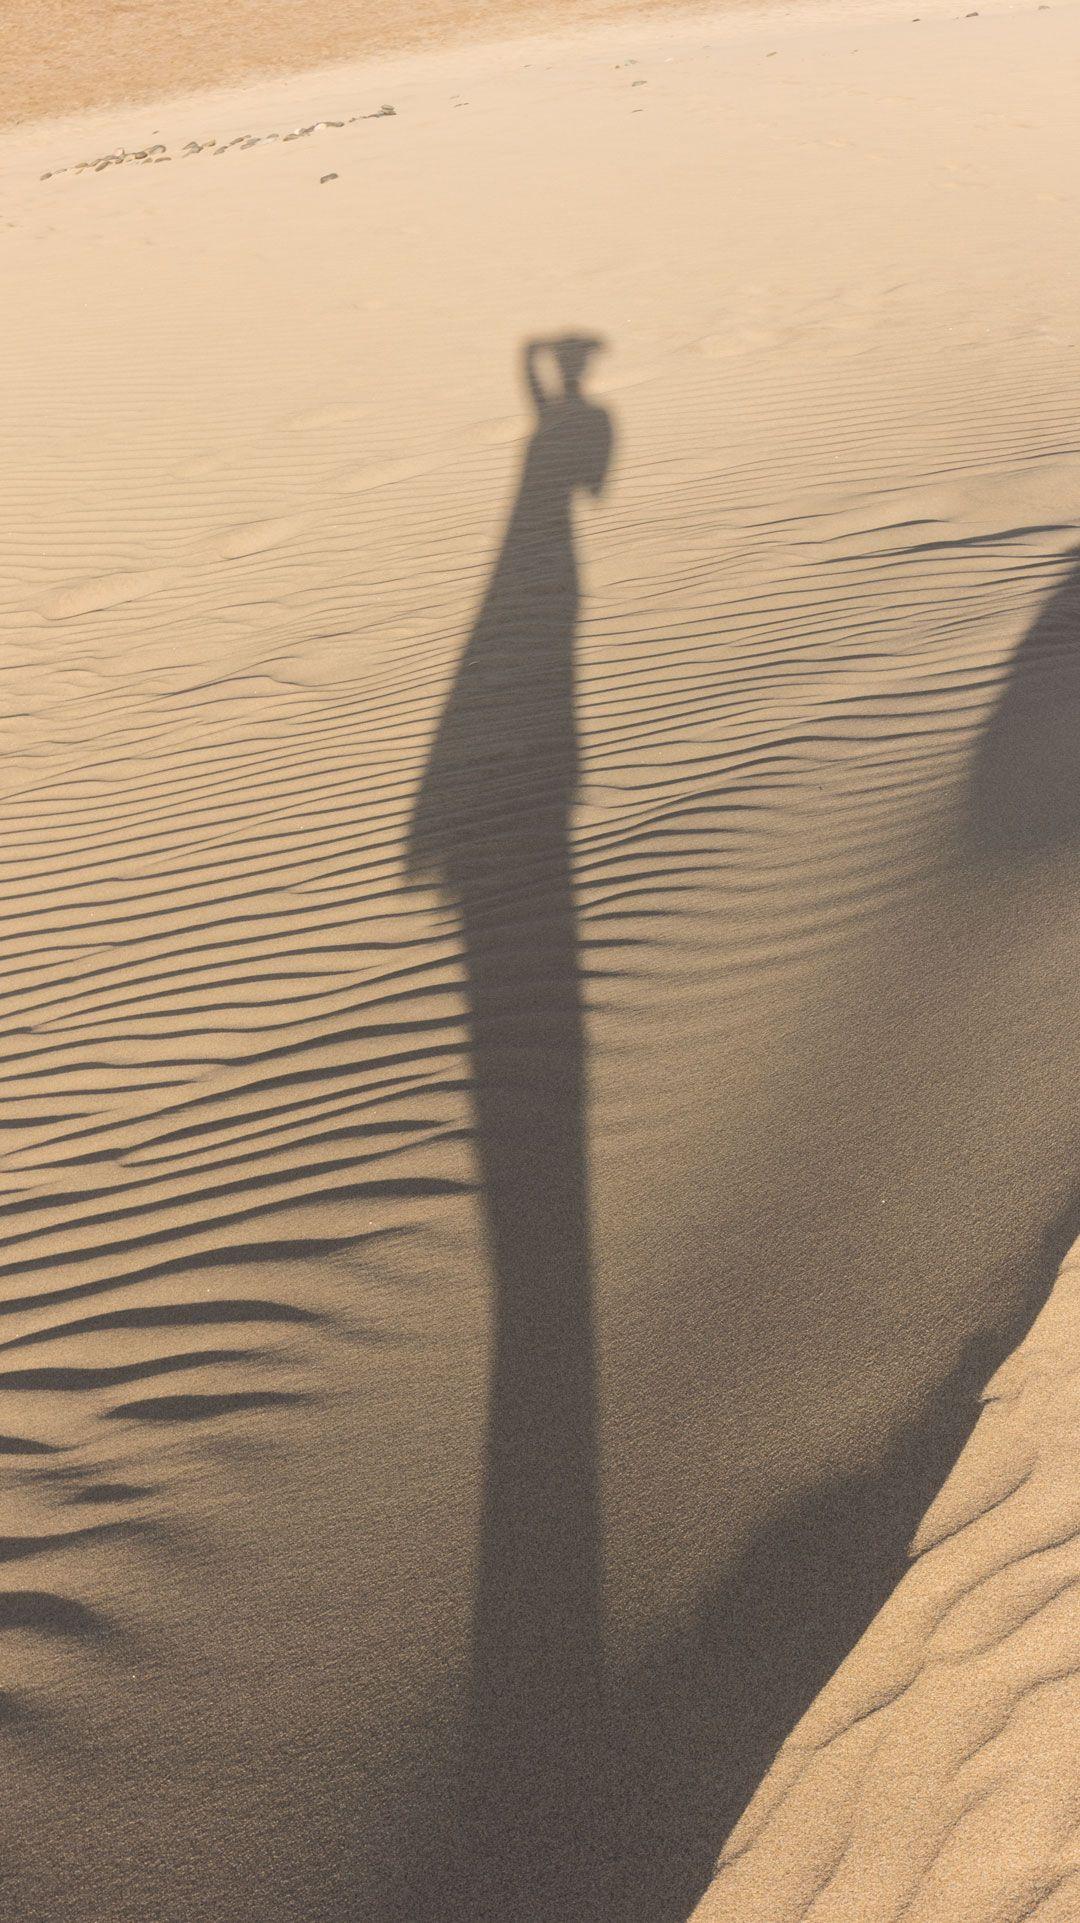 Canarias Photo Diary | What I wore in paradise | #summeroutfit | #allblacklook | culottes | Maspalomas | #whitecottondress | #minimalstyle | #retrostyle | She talks Glam | #GranCanaria | Holidays in a desert looking beach | #Beachstyle | Summer outfit inspiration | Minimal fashion | Saida Antolin | Canary Islands | Effortless casual style | #boyfriendshirt | #printeddress | tropical print | #shirtdress | Tropical style